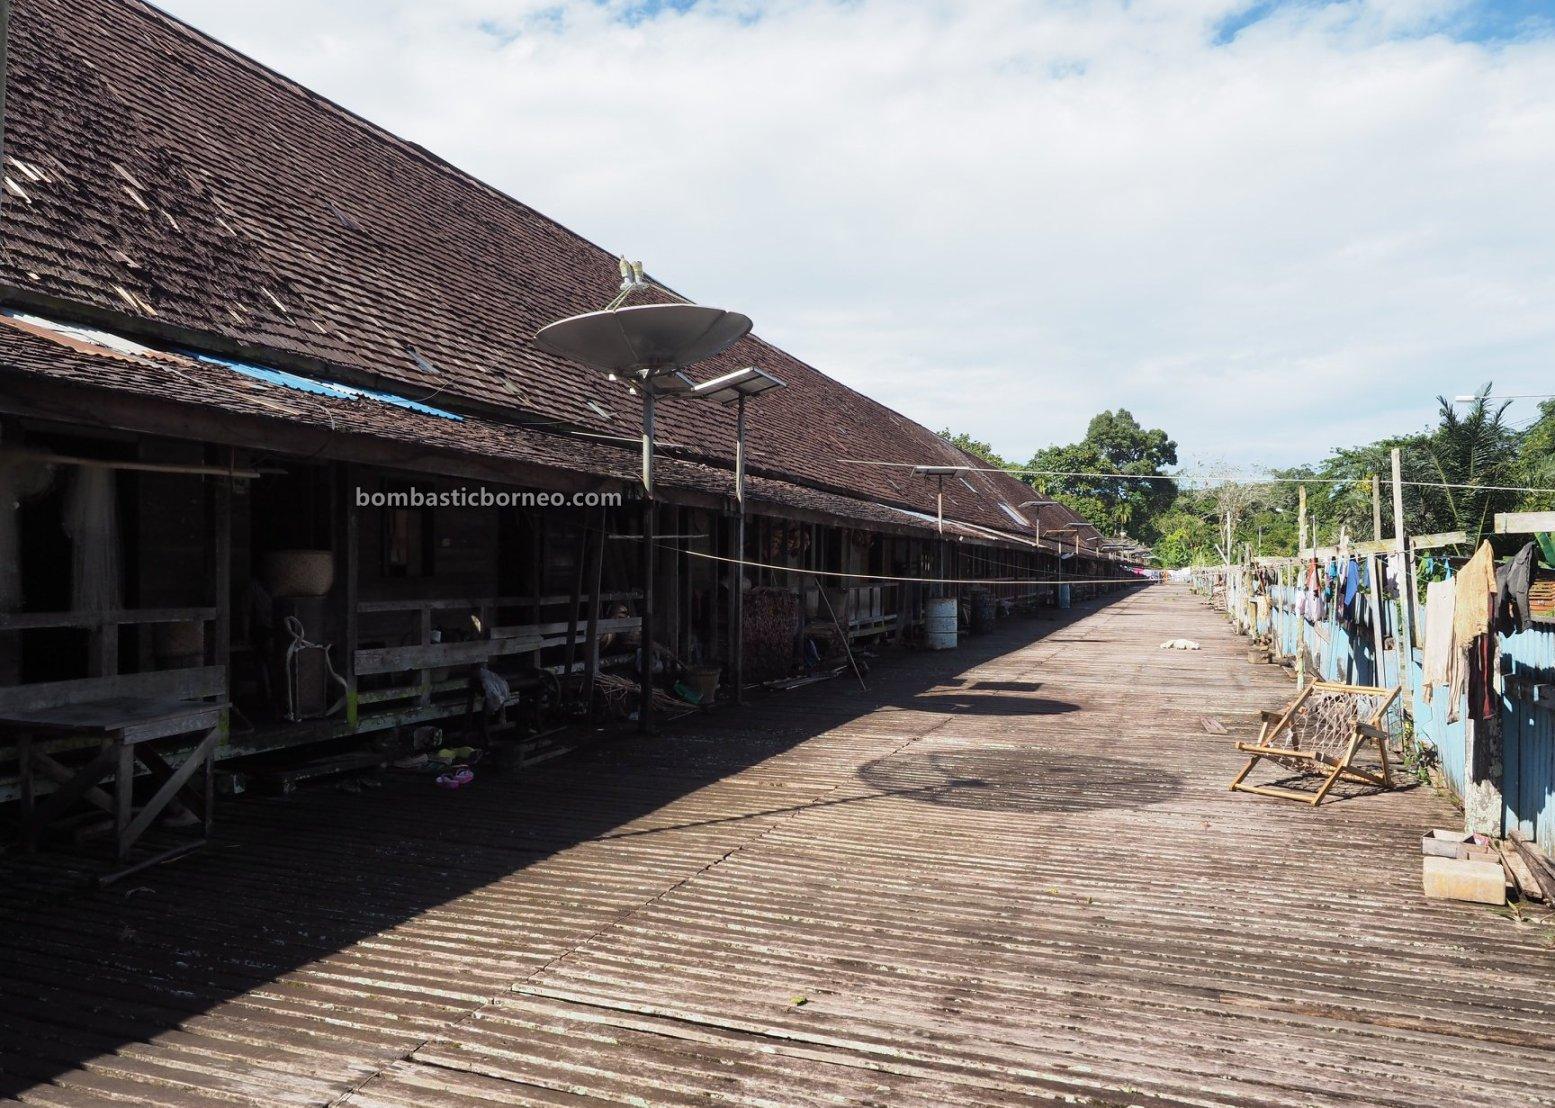 Rumah Betang Sungai Utik, Longhouse, authentic, Indonesia, Kalimantan Barat, Kapuas Hulu, Suku Dayak Iban, native, tribe, Tourism, tourist attraction, travel guide, cross border, Borneo, 跨境婆罗洲游踪